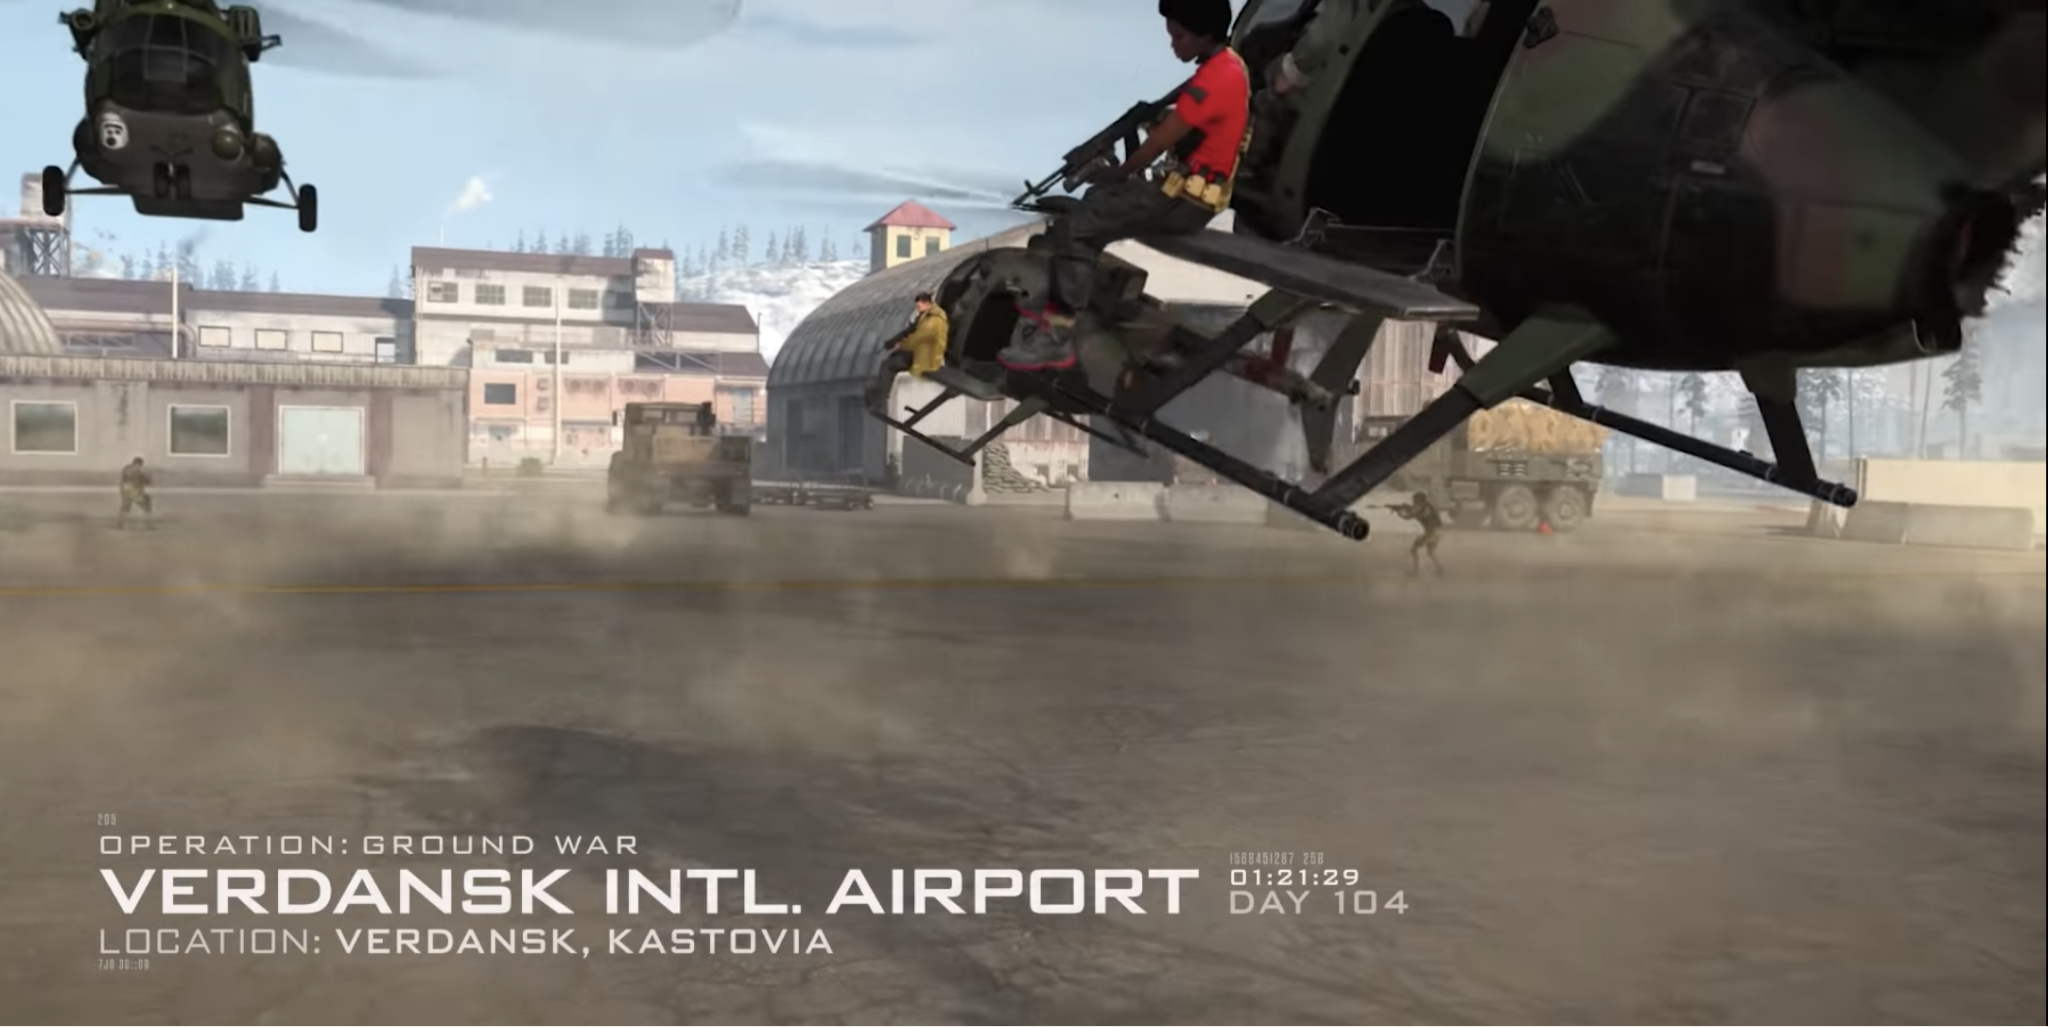 Saison 5 Modern Warfare Warzone Infinity Ward Verdansk Intl Airport